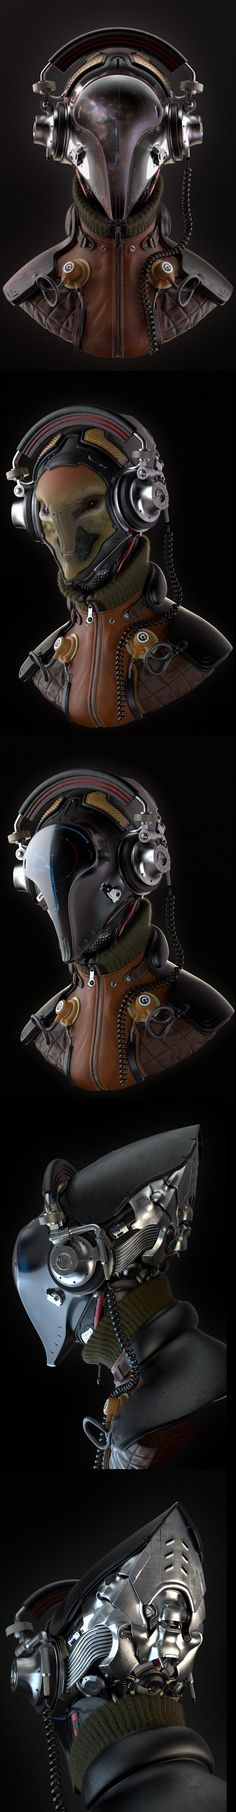 Intergalactic Music Pilot FS by Oleg Memukhin 1221px X 9375px